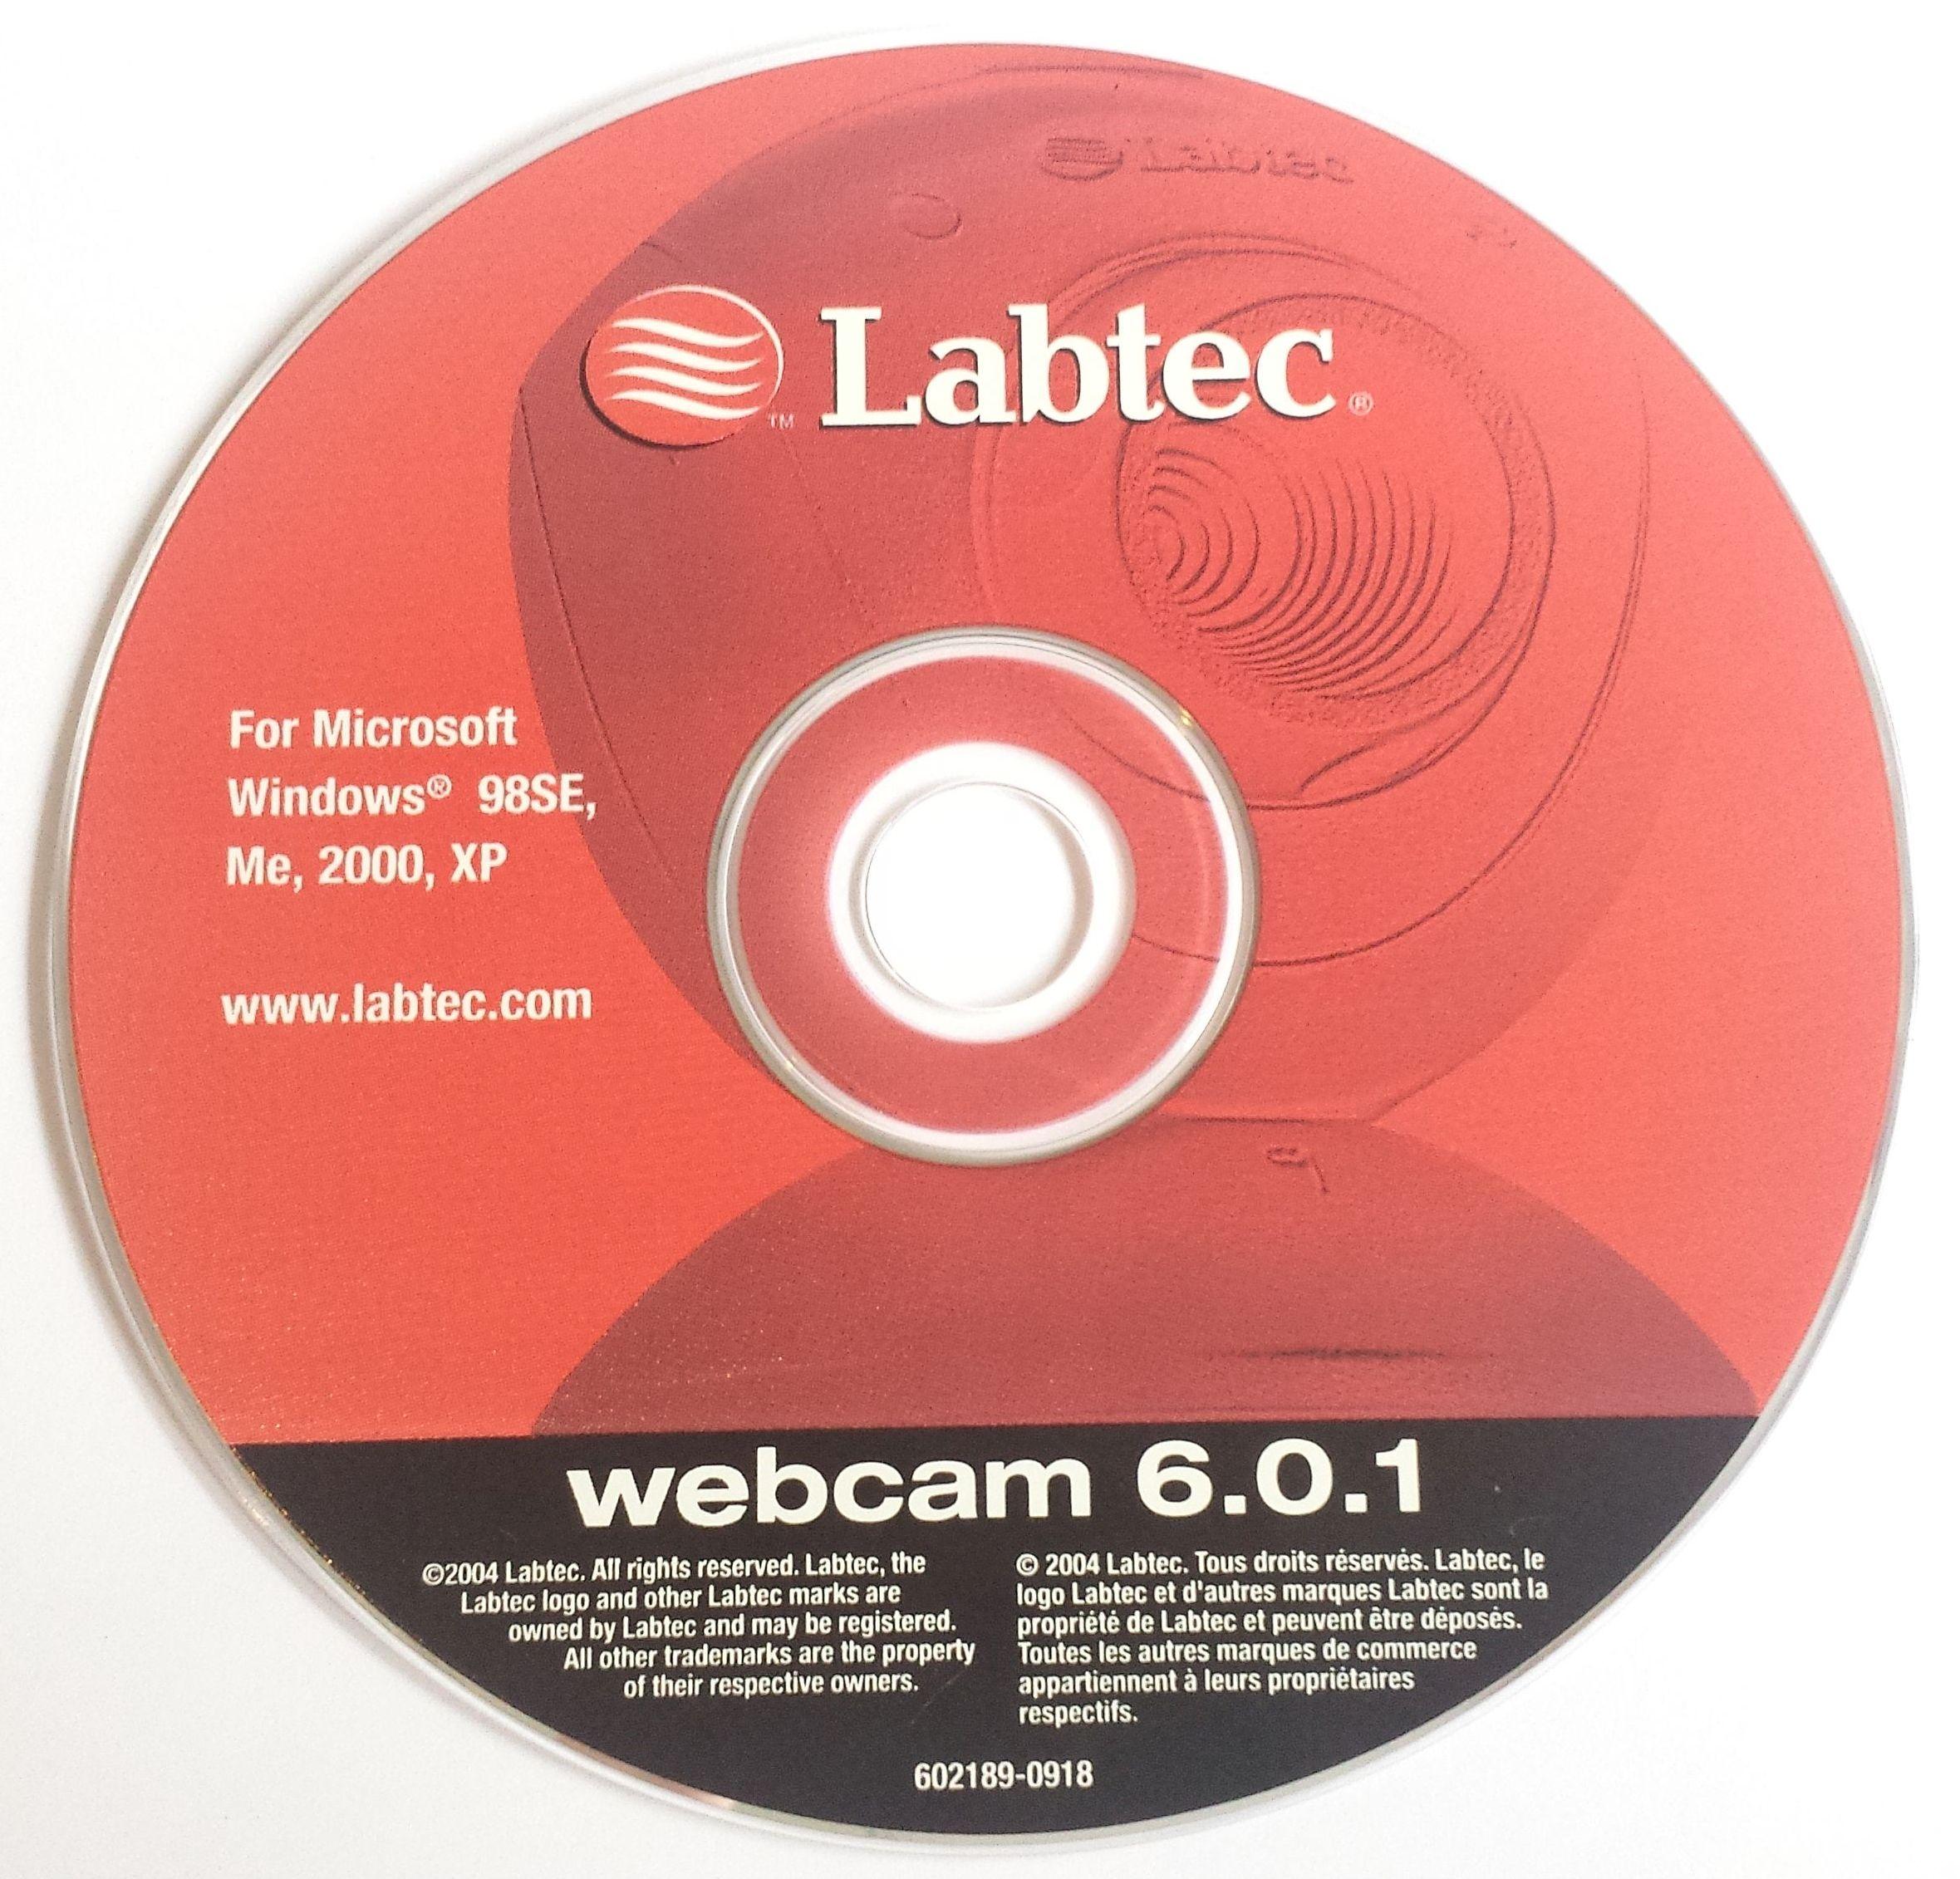 webcam Labtec driver